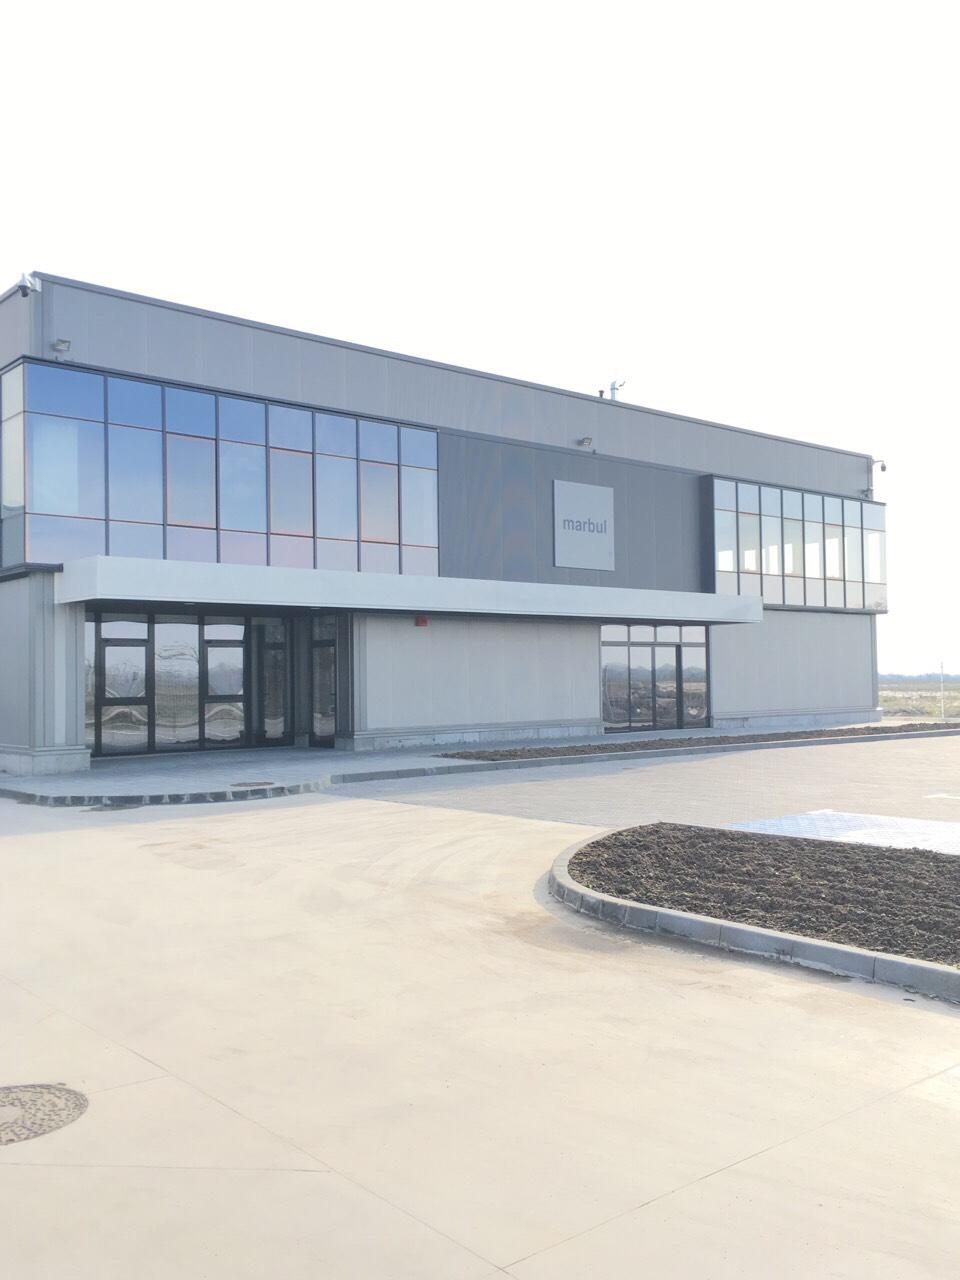 Marbul Factory.jpg